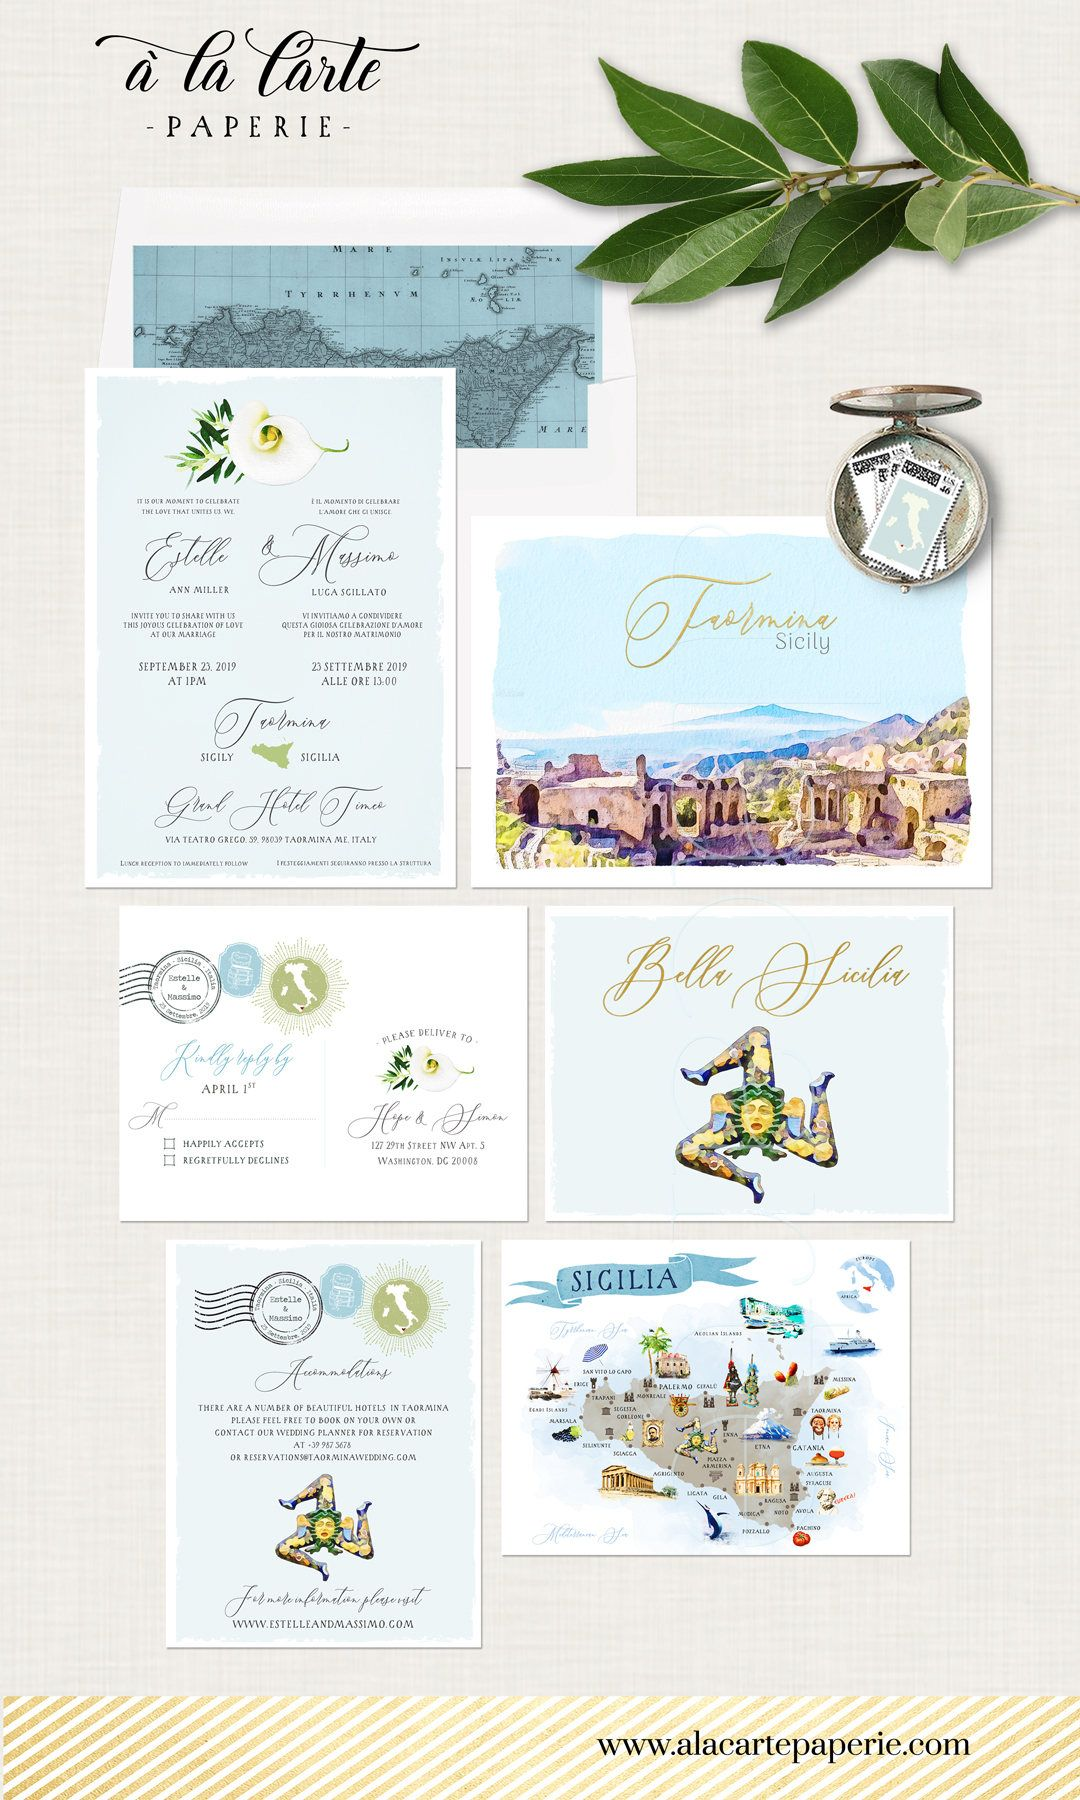 Sicily Taormina Italy Italian Sicilian Destination Wedding